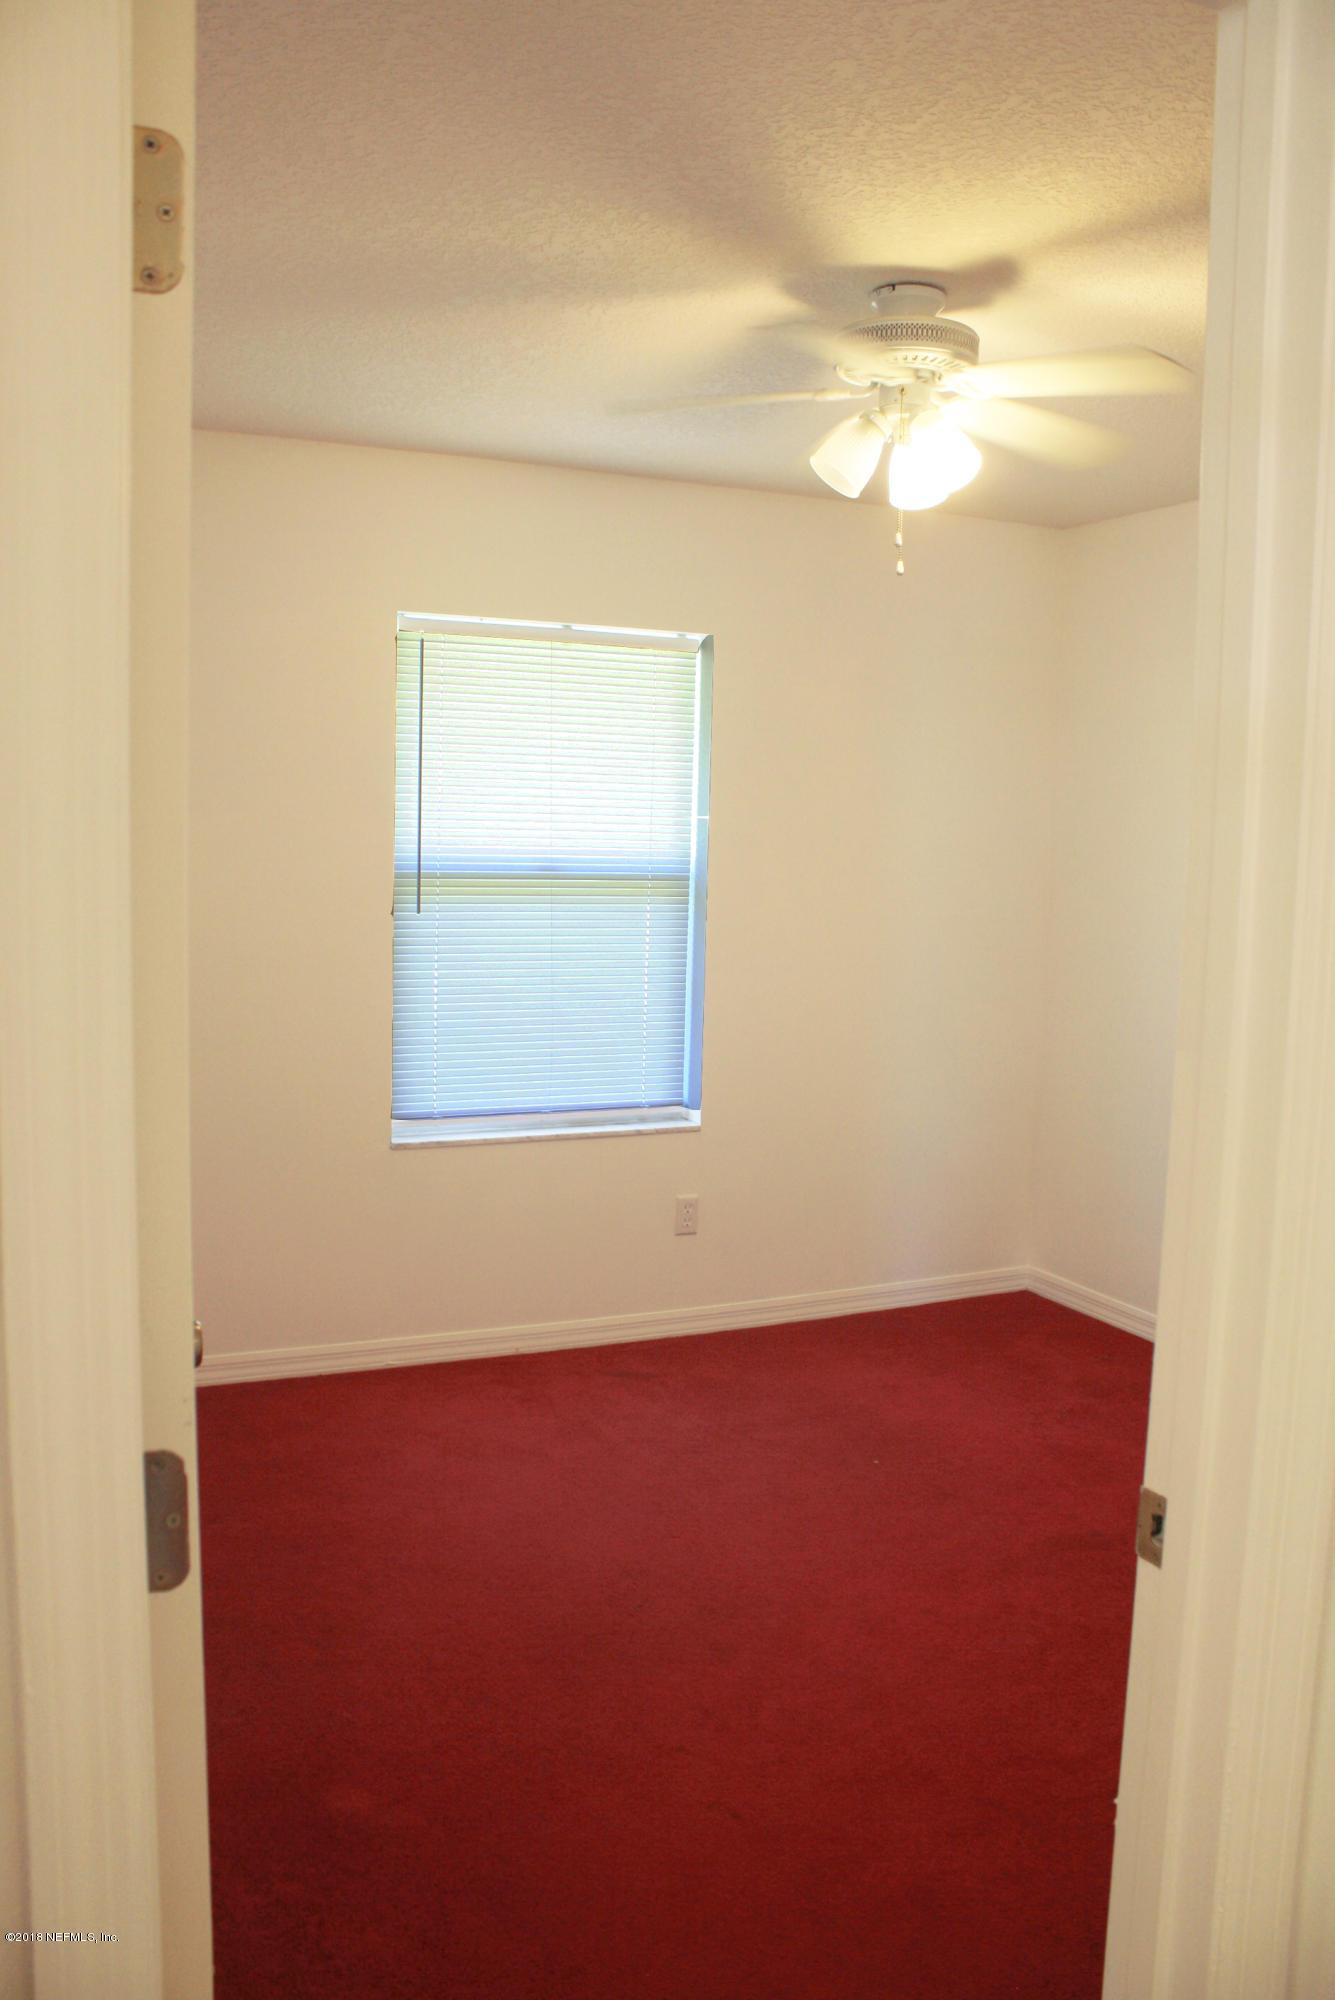 18 RADFORD, PALM COAST, FLORIDA 32164, 3 Bedrooms Bedrooms, ,2 BathroomsBathrooms,Residential - single family,For sale,RADFORD,937118